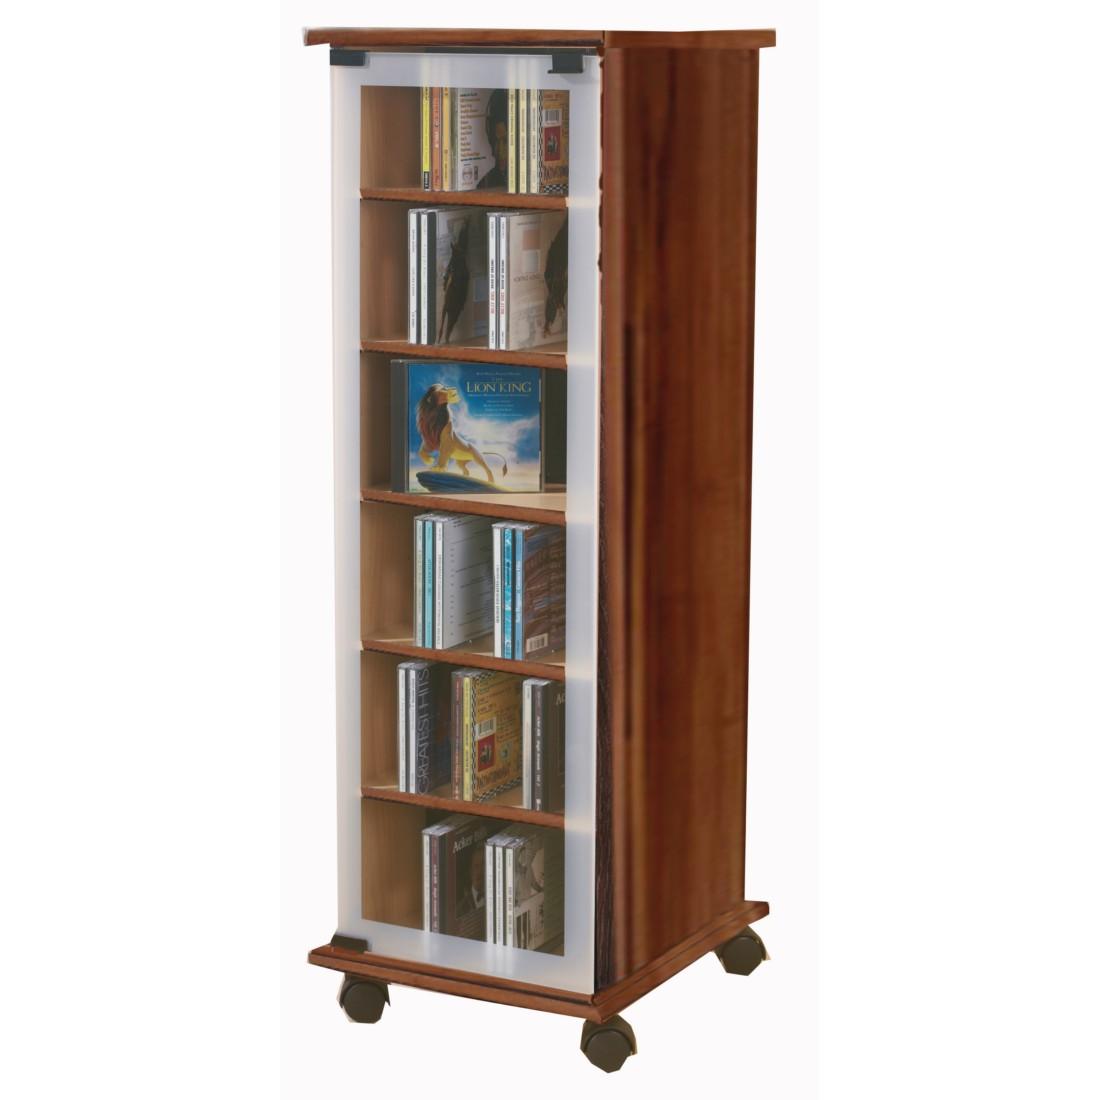 dvd cd regal valenza nussbaum dekor vcm g nstig online kaufen. Black Bedroom Furniture Sets. Home Design Ideas